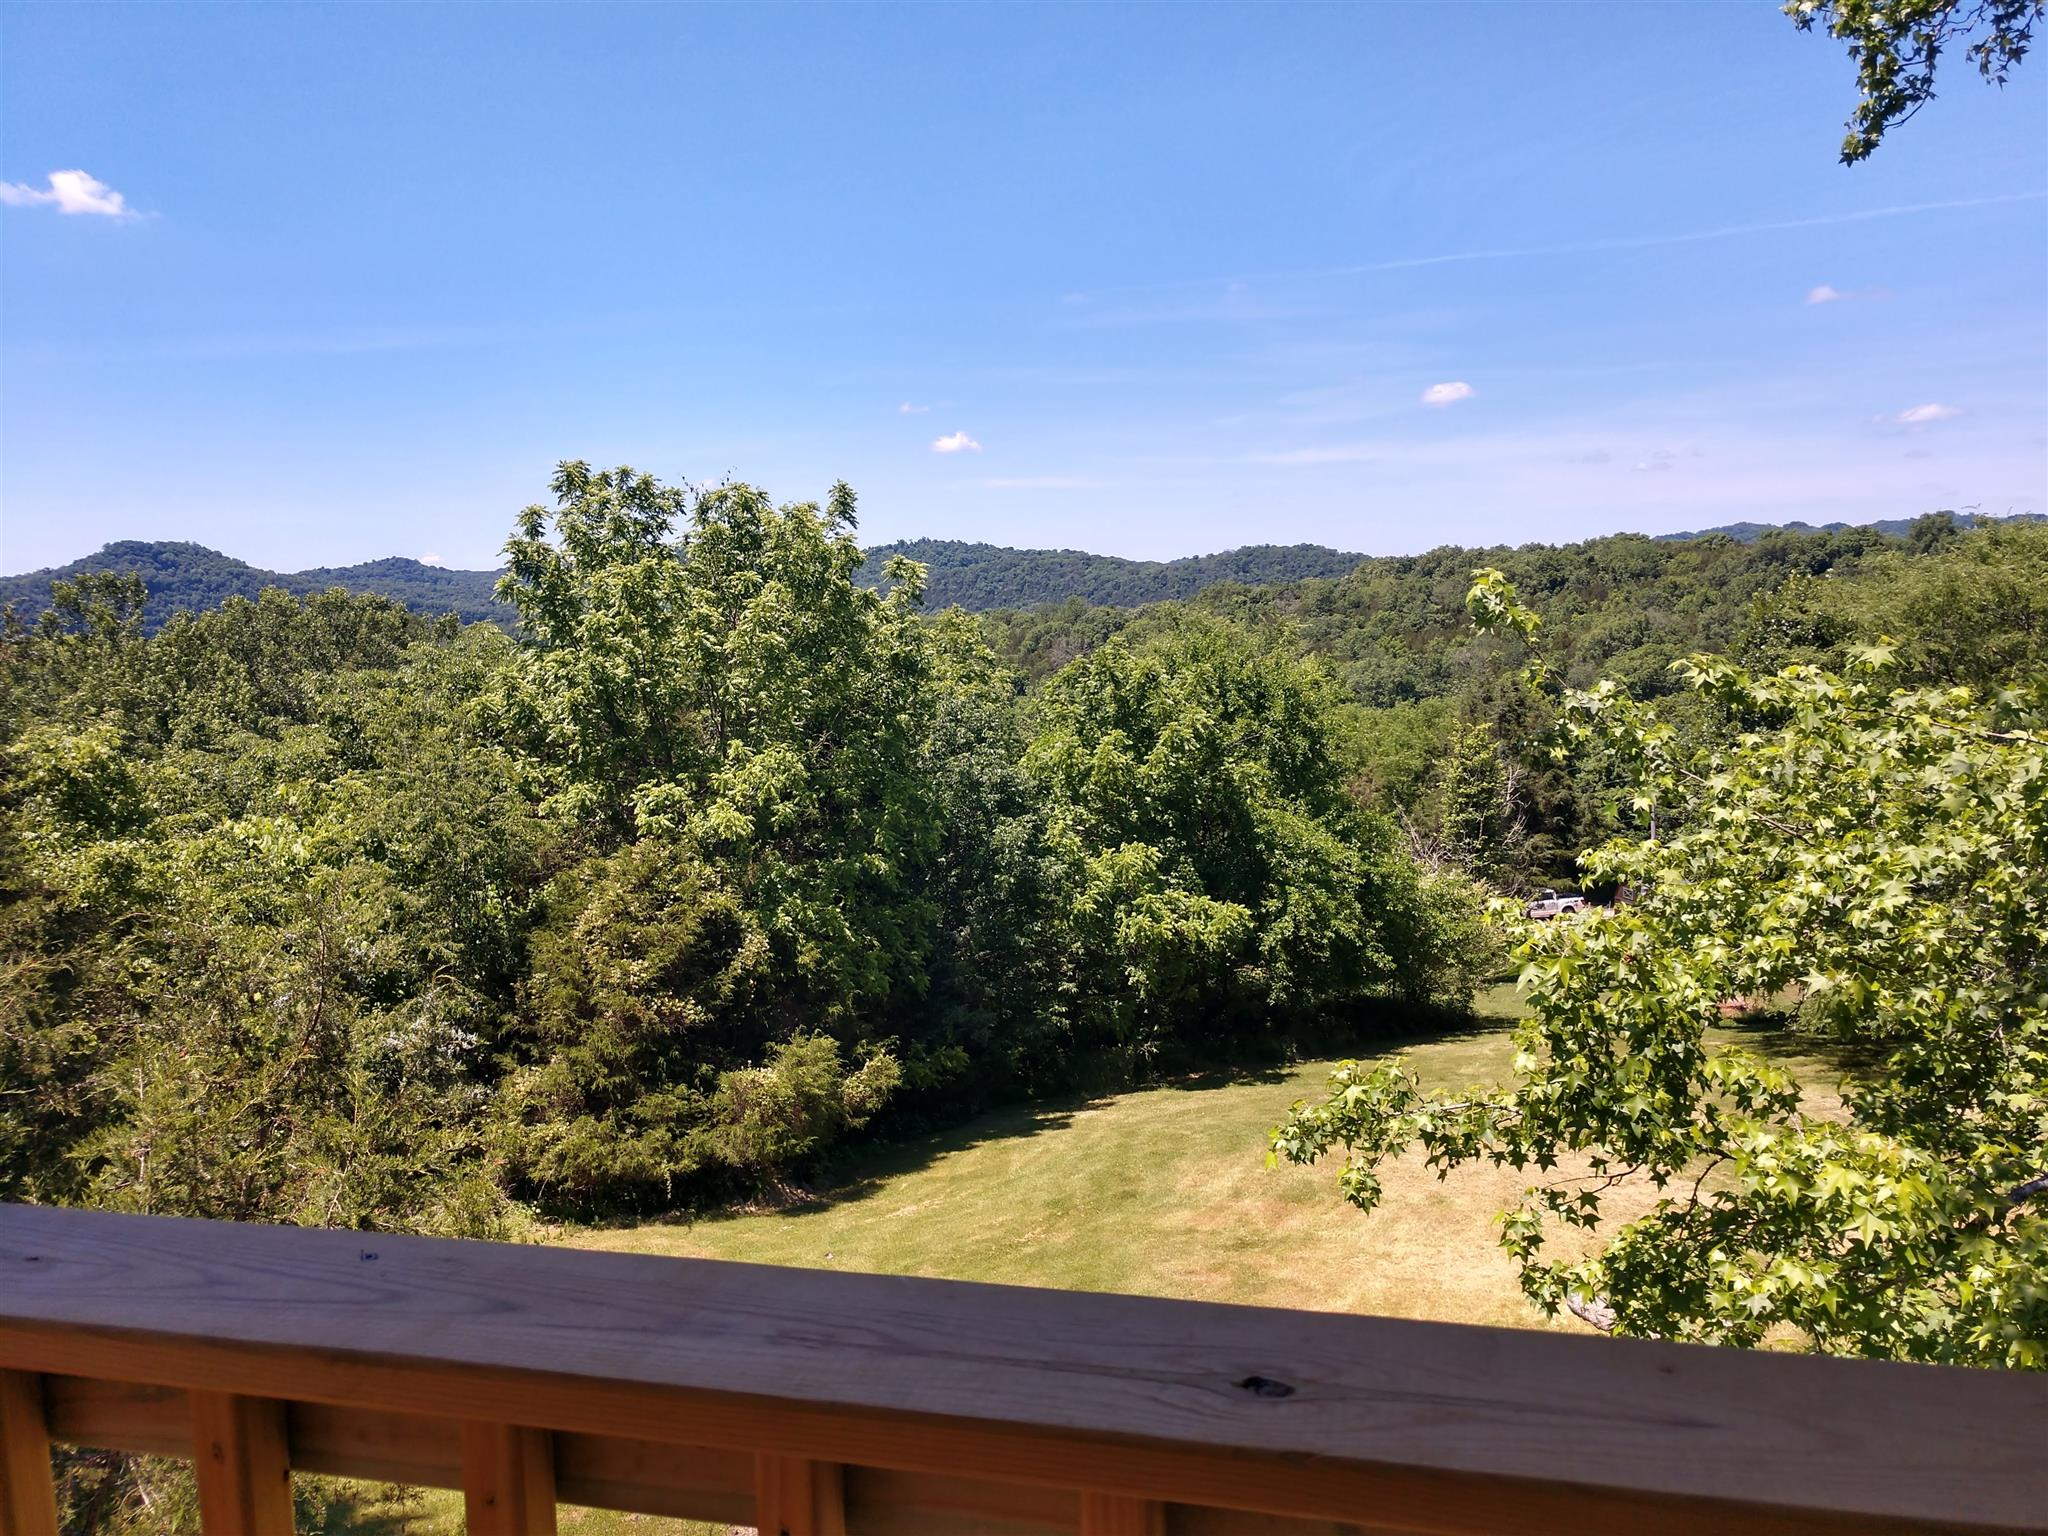 153 Shepherd Ln, Granville, TN 38564 - Granville, TN real estate listing